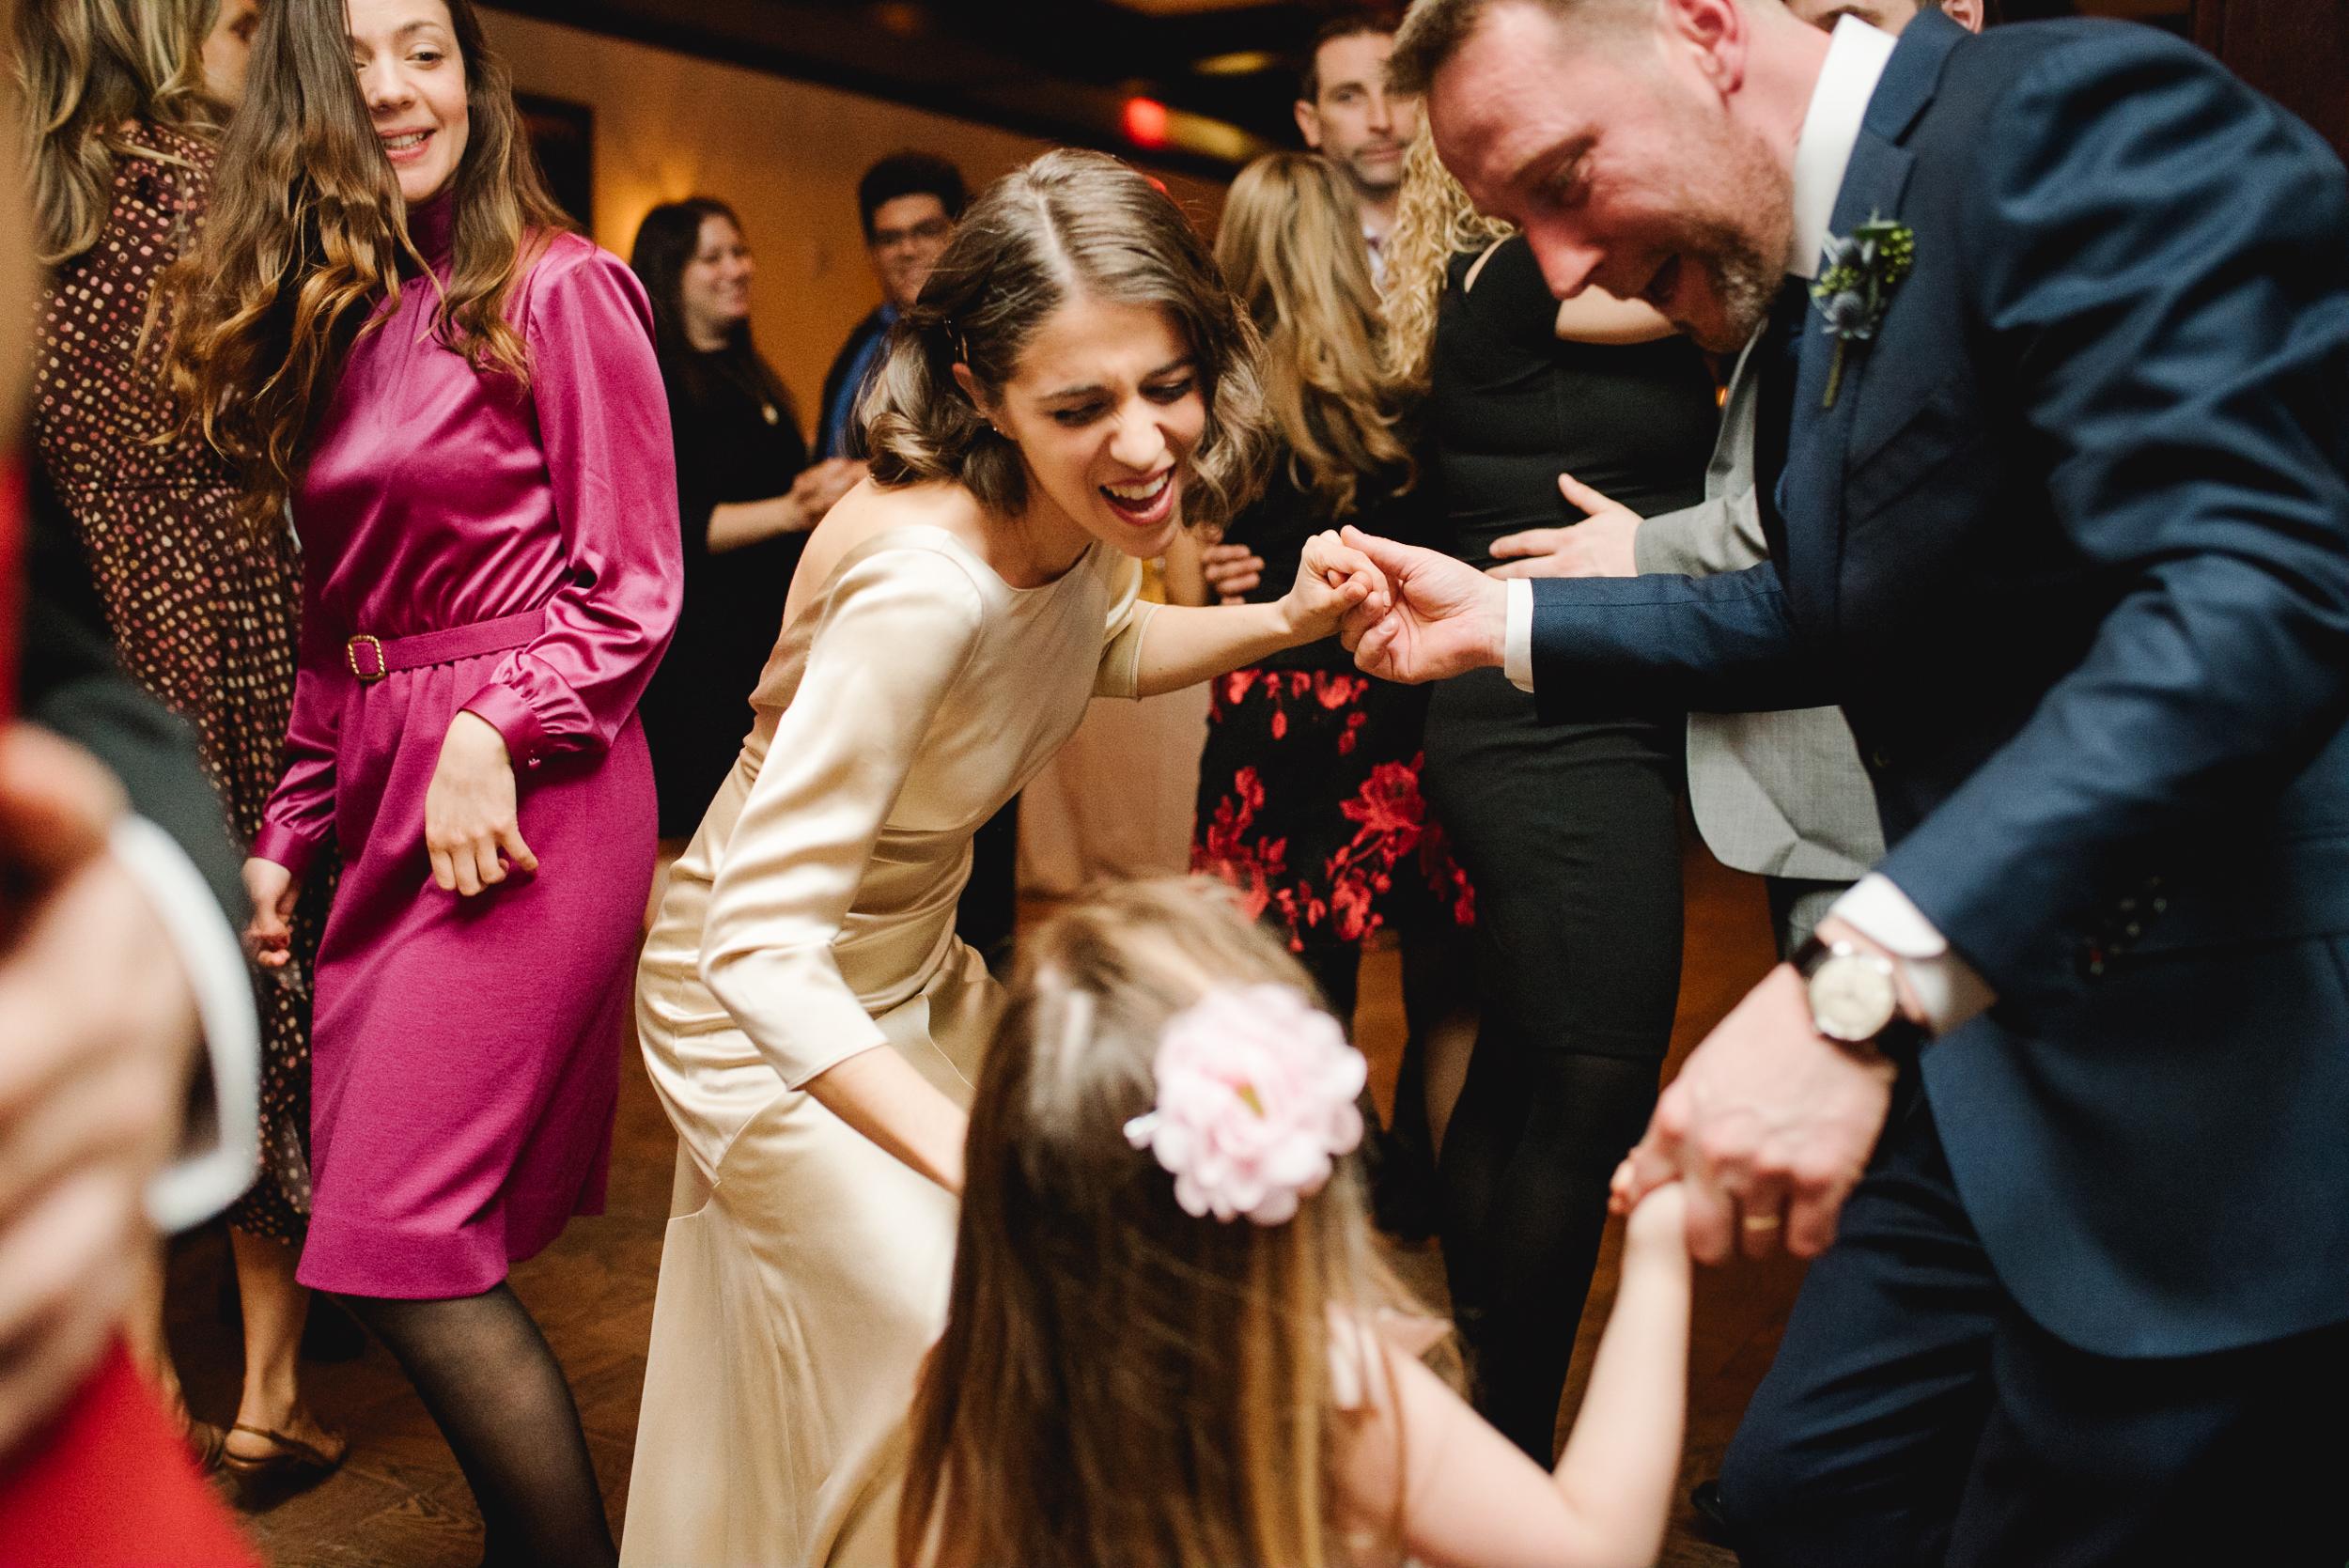 Hotel-du-village-wedding-winter-february-peaberry-photography-philadelphia-photographer-057.jpg